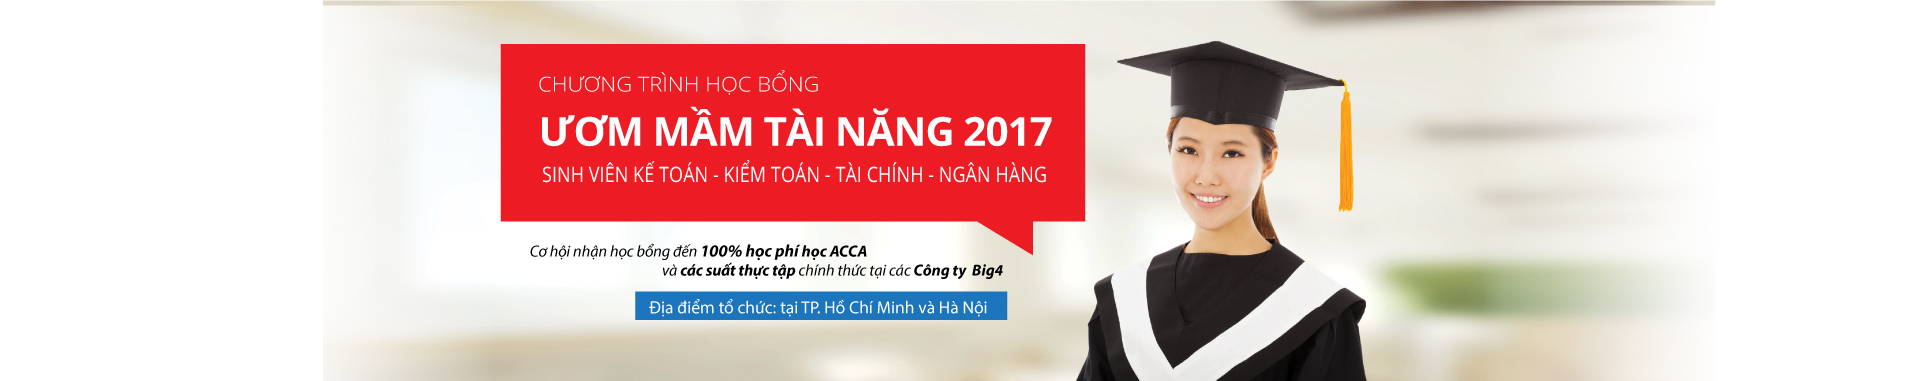 banner-web-uommam-tai-nangsv-2017